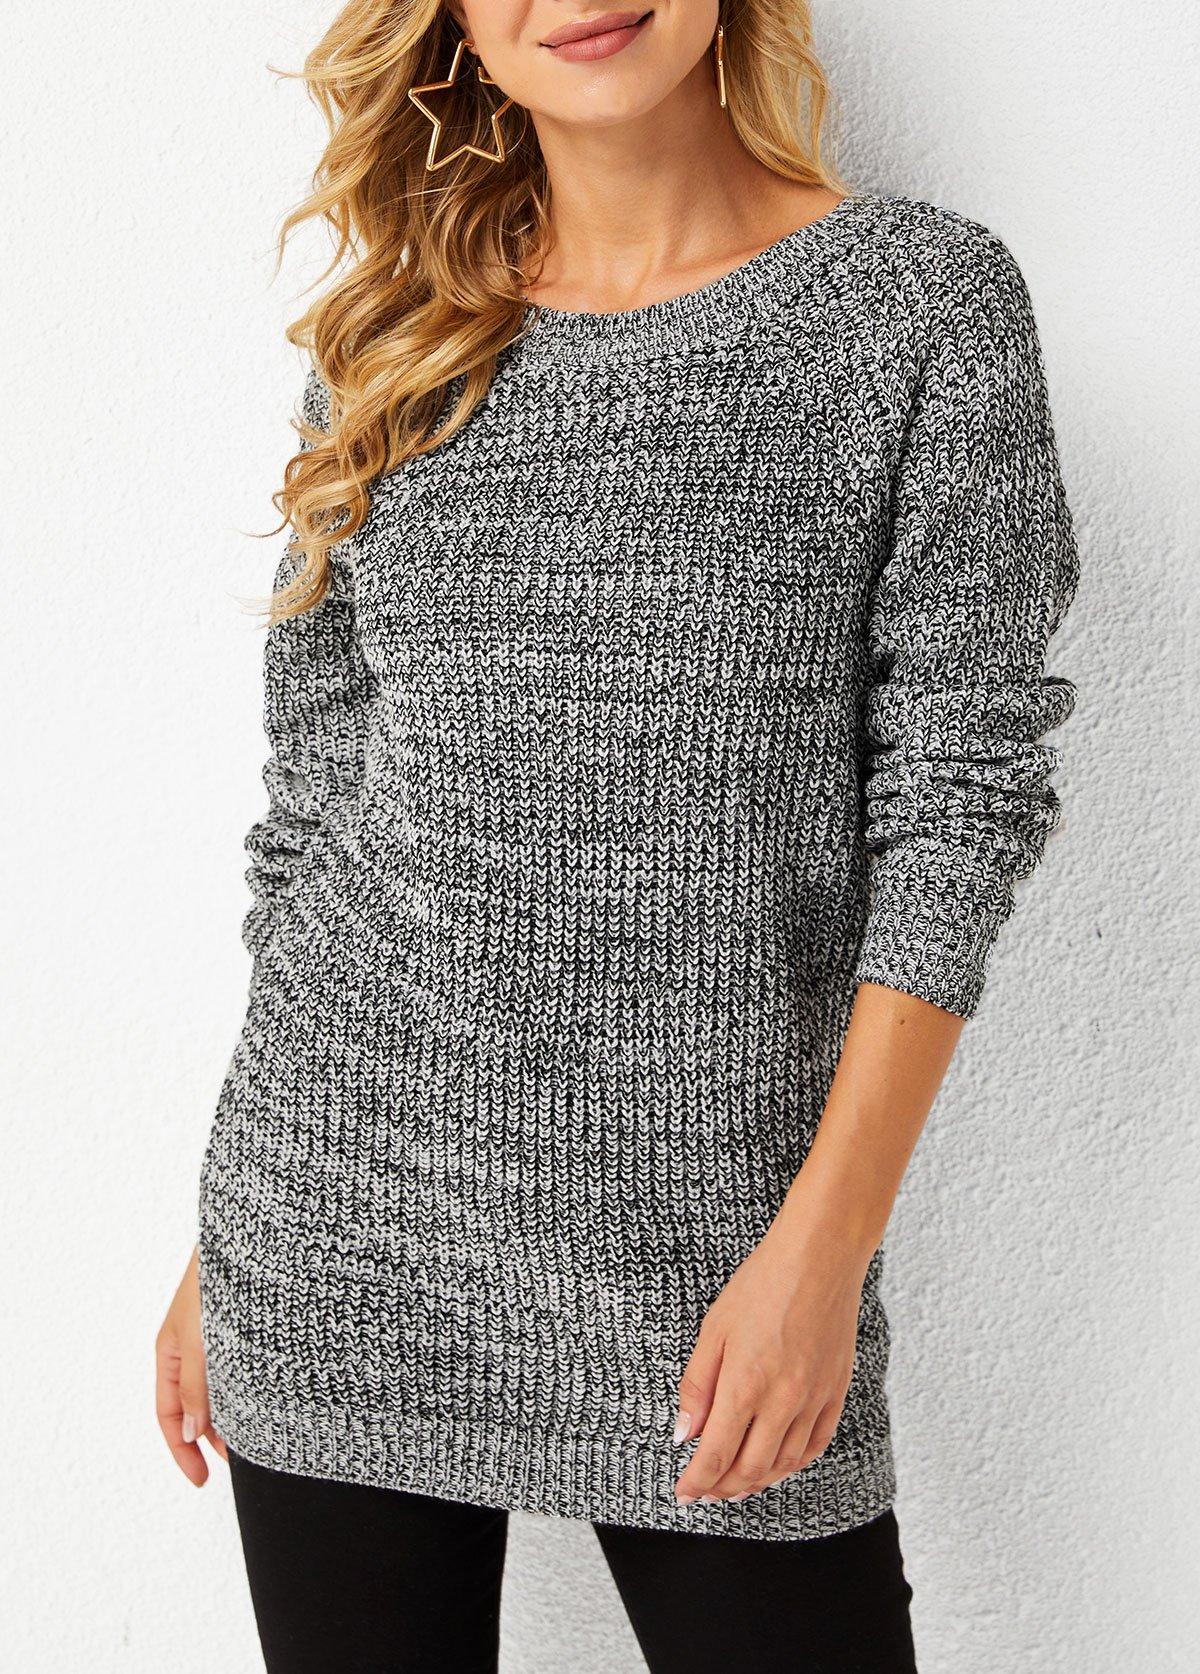 ROTITA Round Neck Bowknot Detail Long Sleeve Sweater